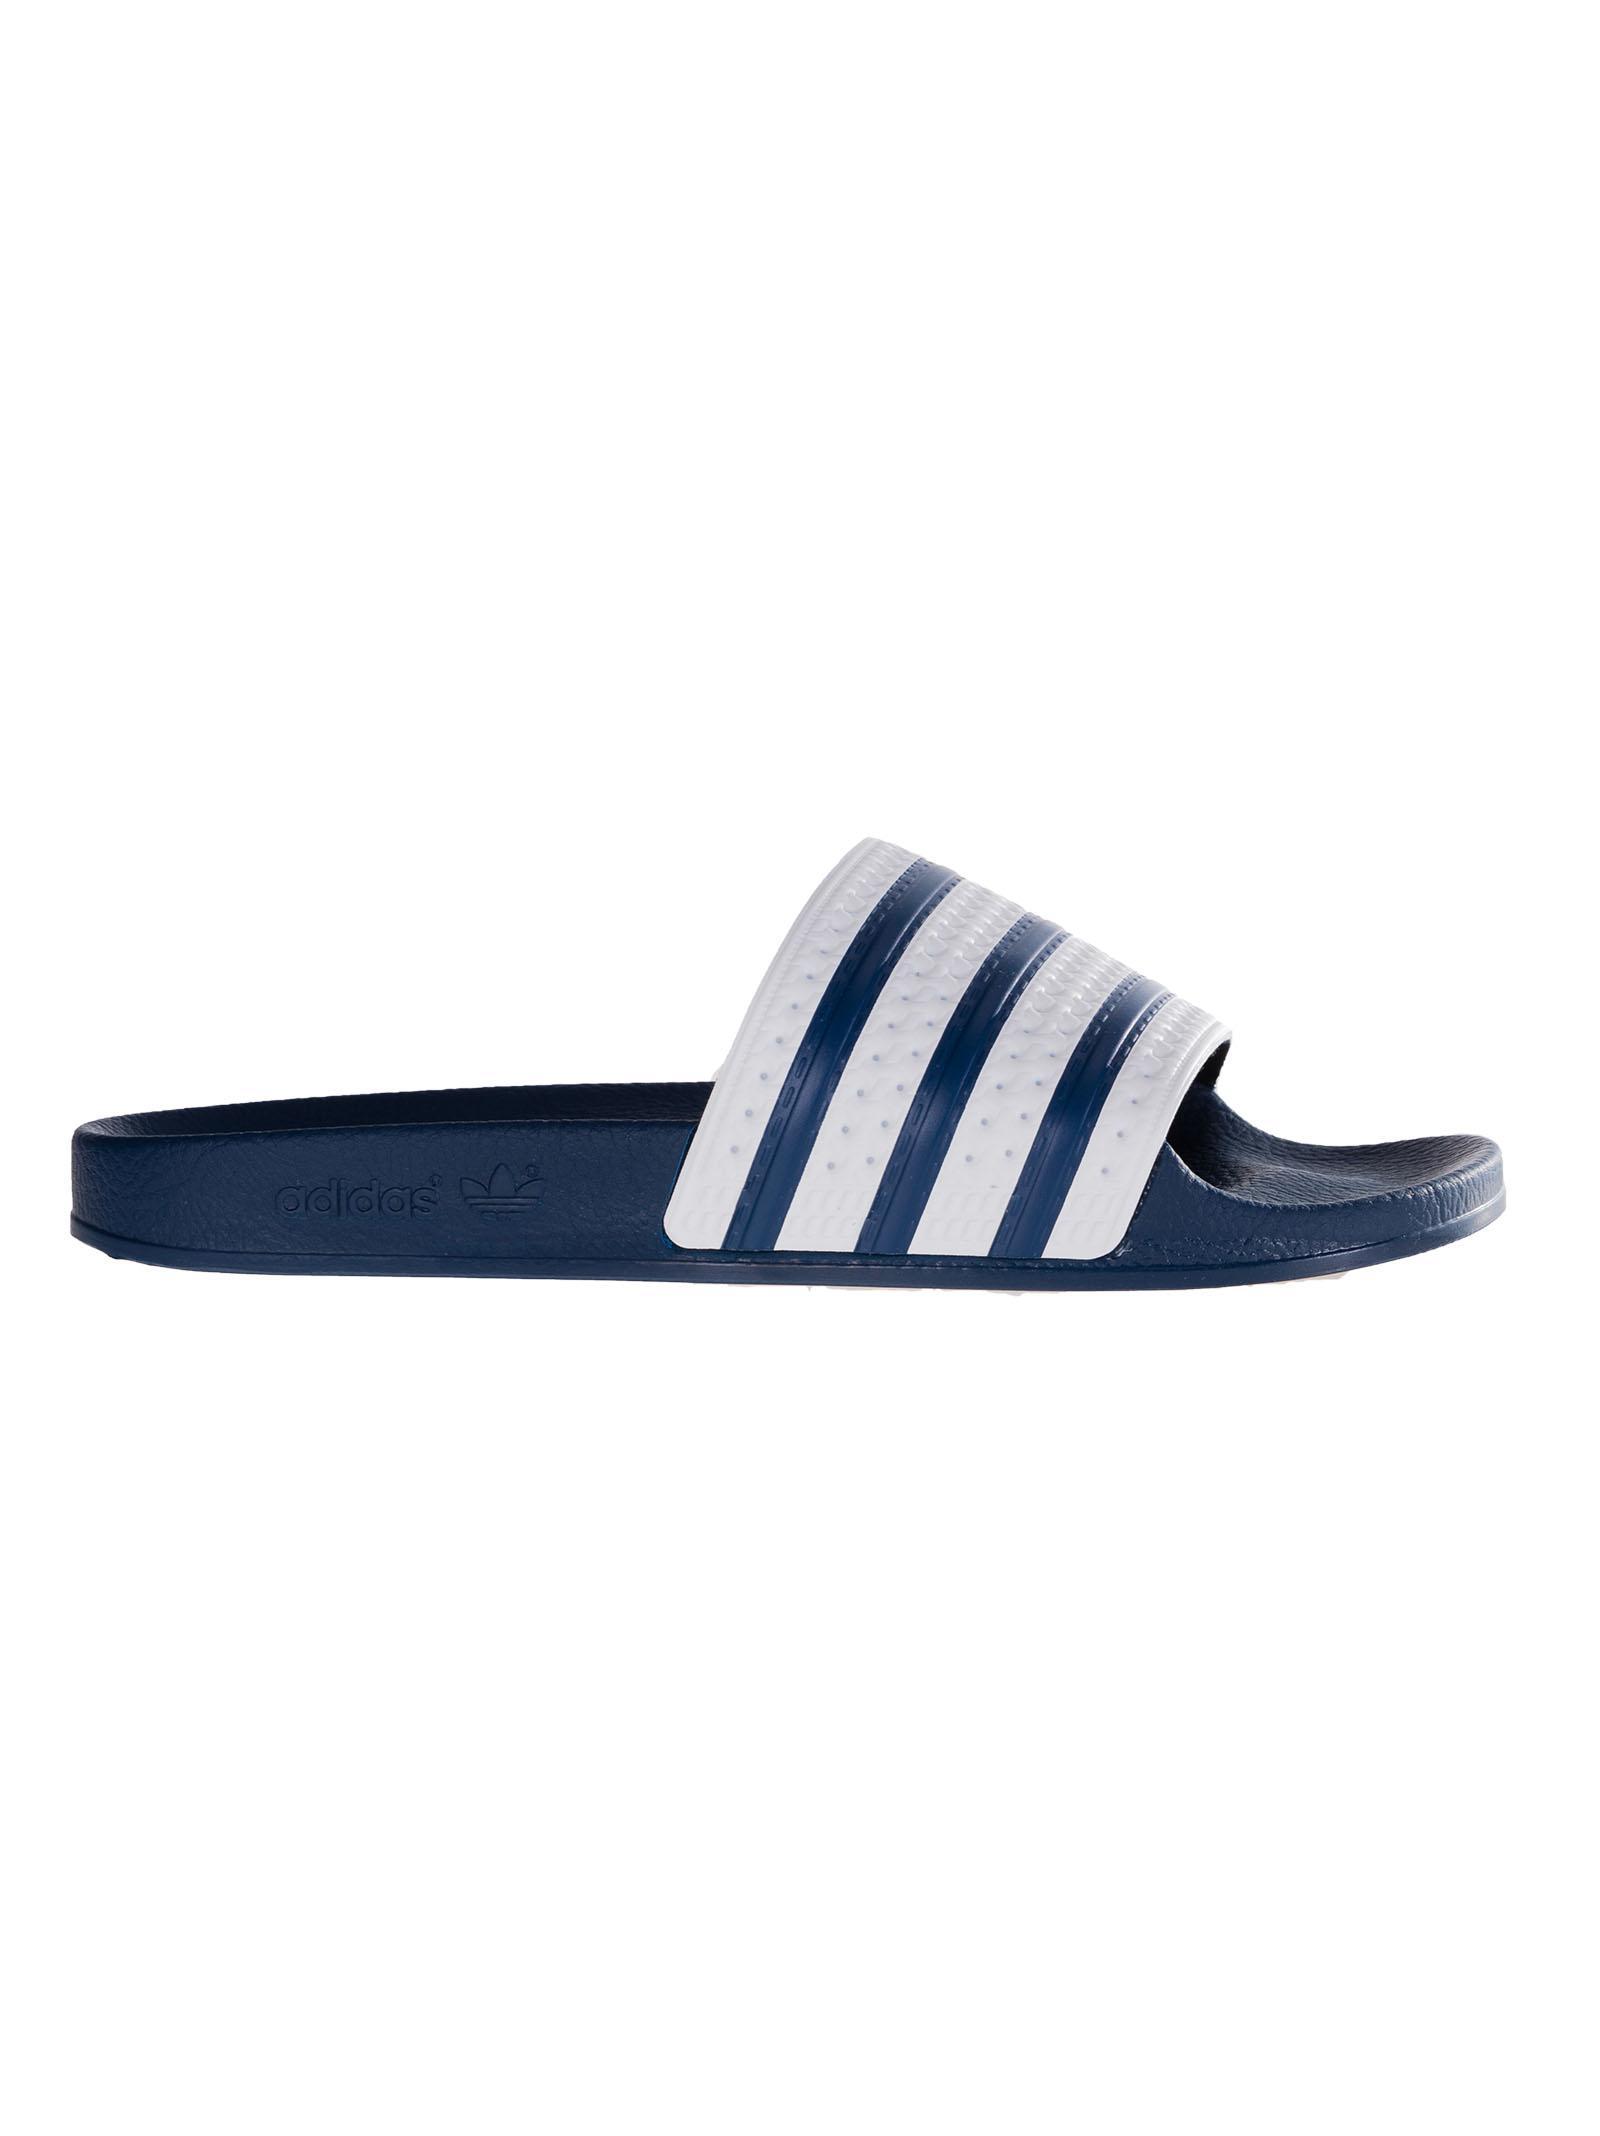 new styles 27f13 bbf93 adidas. Mens Blue Adilette